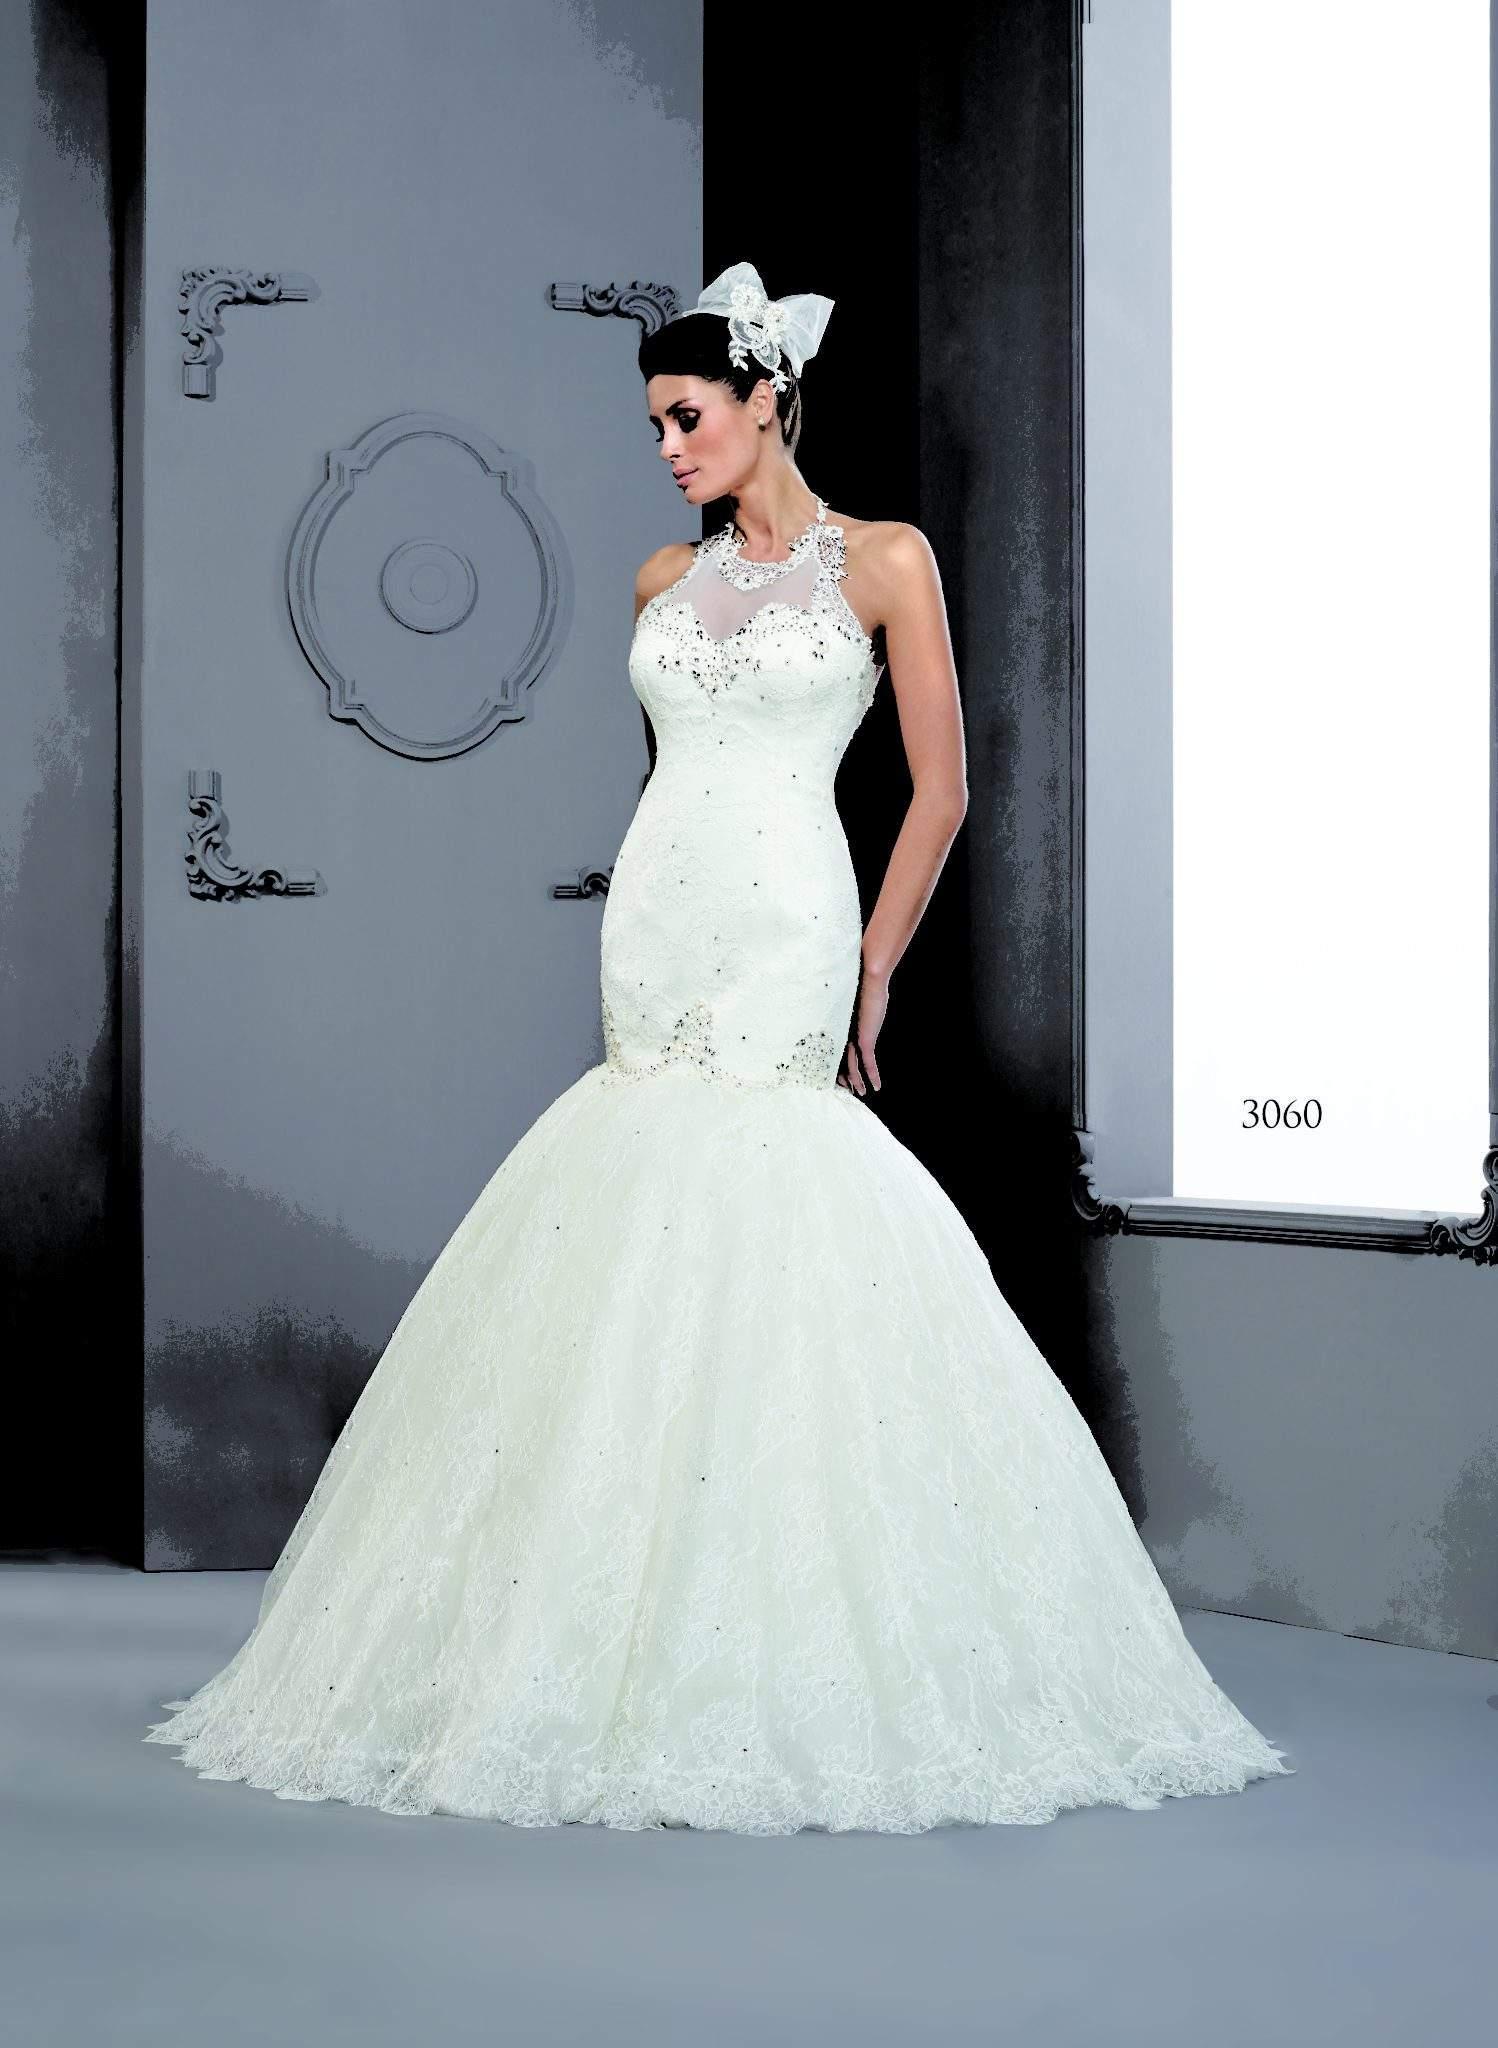 Ritzy Louisville Cheap Halter Wedding Dresses Halter Wedding Dresses Darius Cordell Fashion Ltd Halter Wedding Dresses David S Bridal Halter Wedding Dresses wedding dress Halter Wedding Dresses